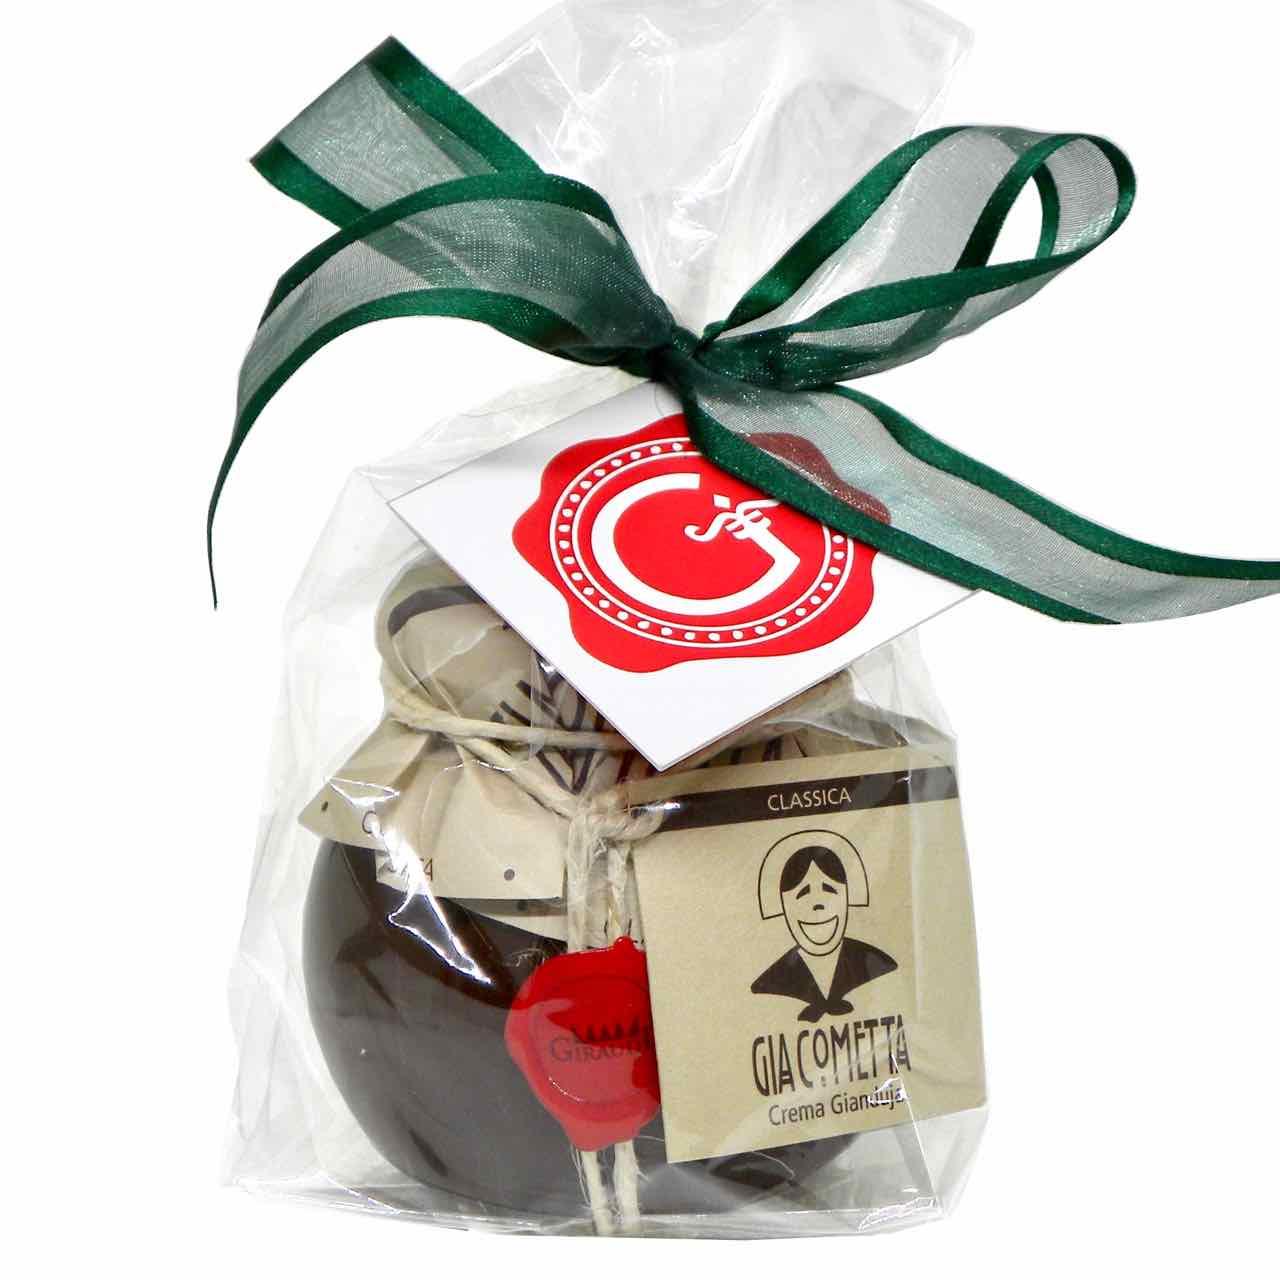 gift package Giacometta Giraudi – shop online – Gustorotondo – best Italian food – Gustorotondo online food shop – authentic Italian artisan food